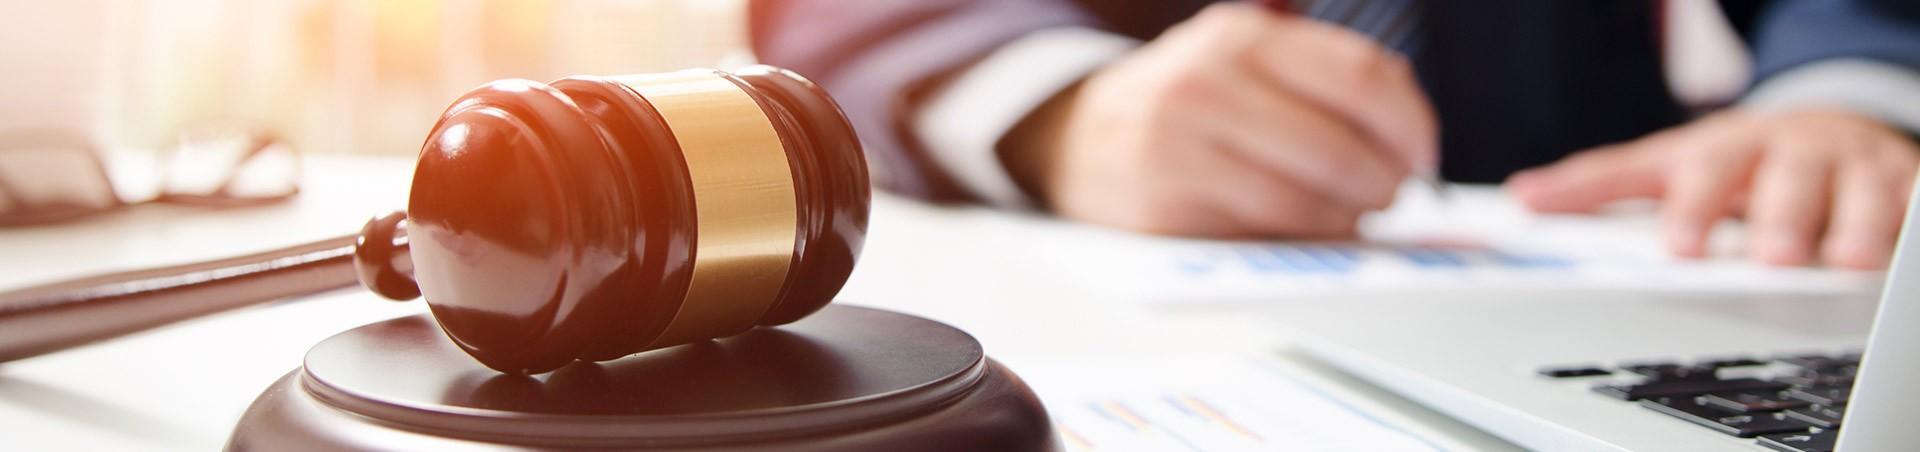 Rechtbank Advocaat Strafrecht